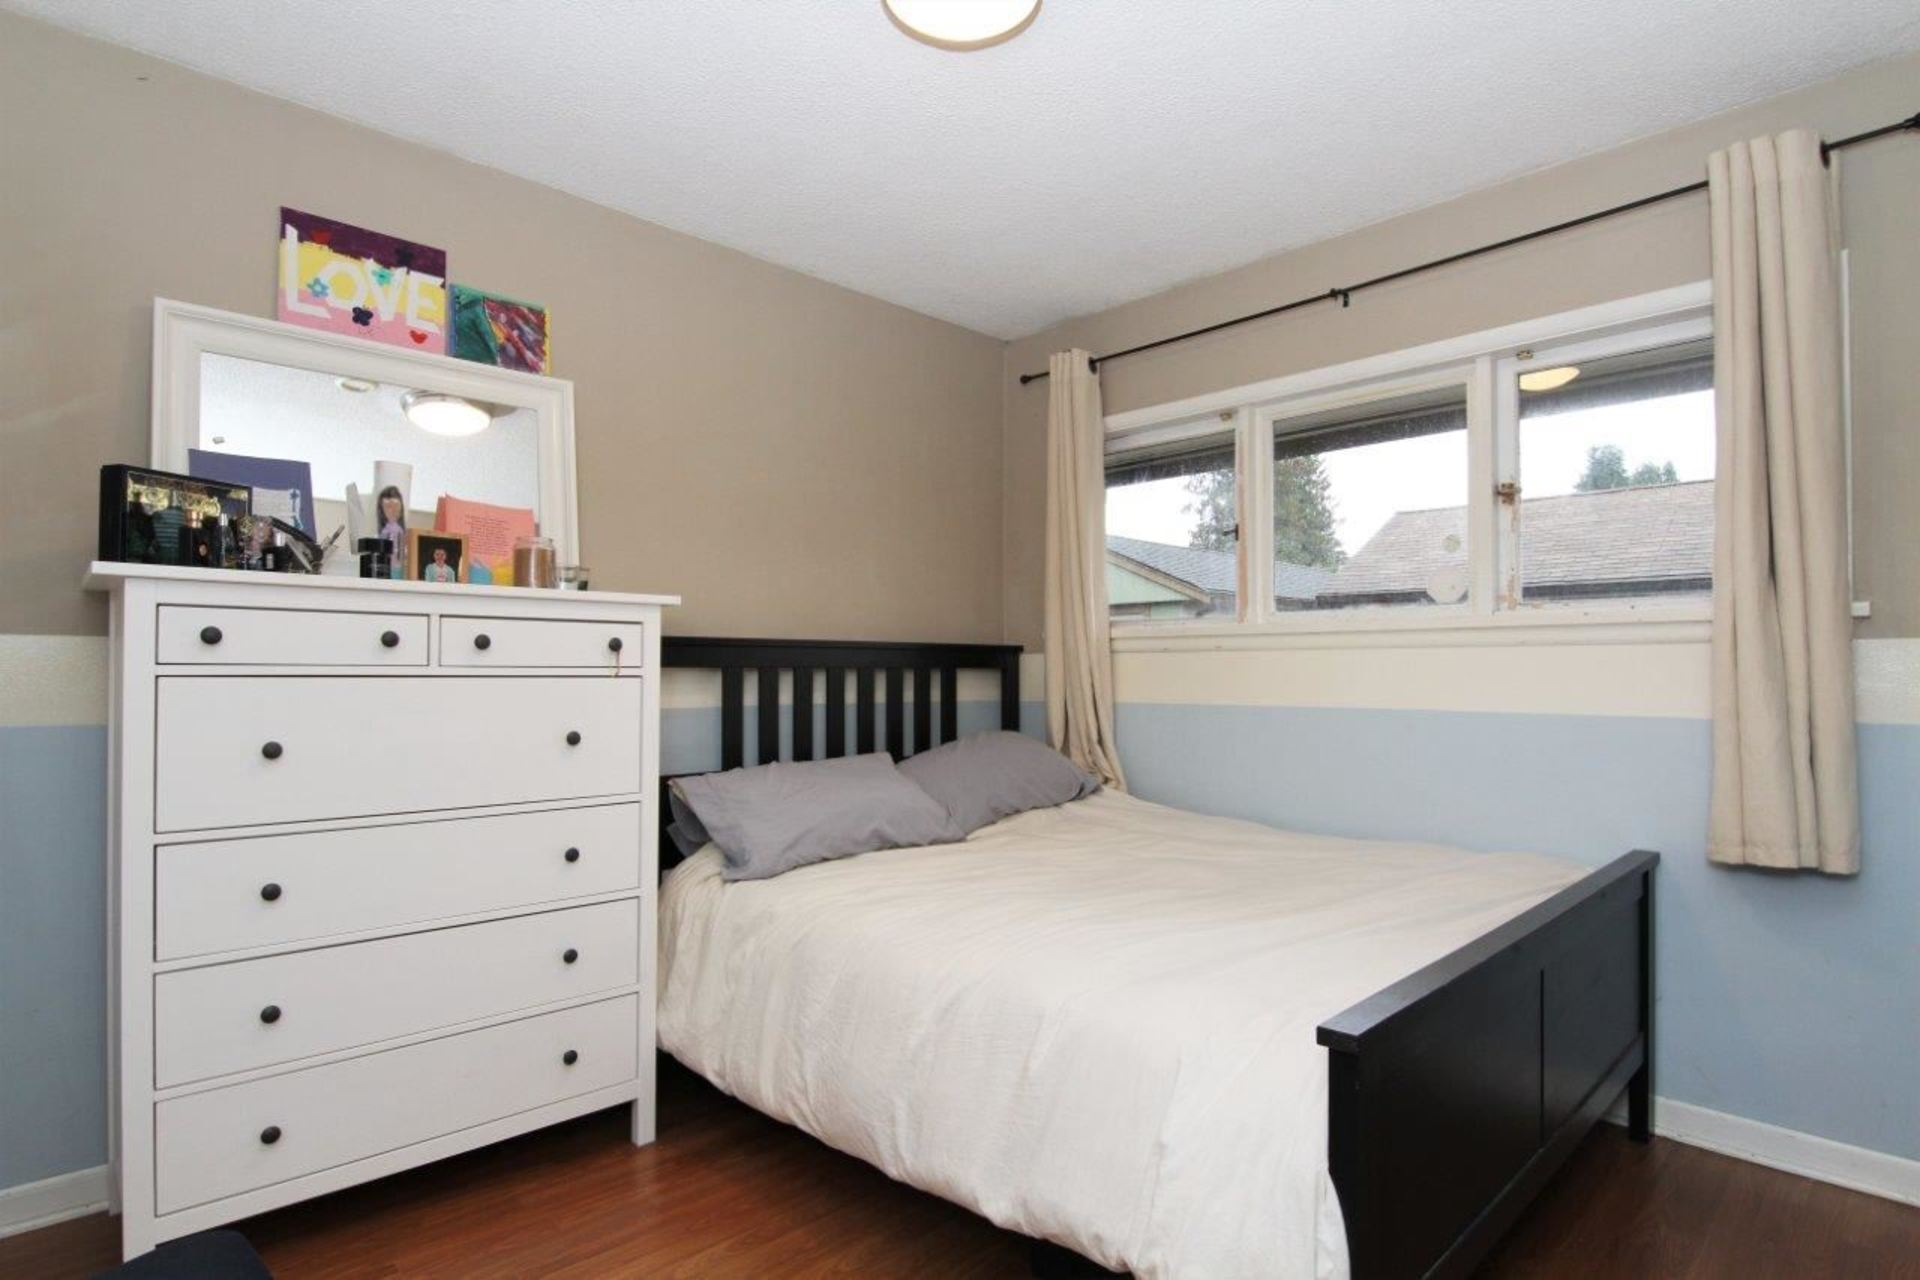 12351-203-street-west-central-maple-ridge-06 at 12351 203 Street, West Central, Maple Ridge